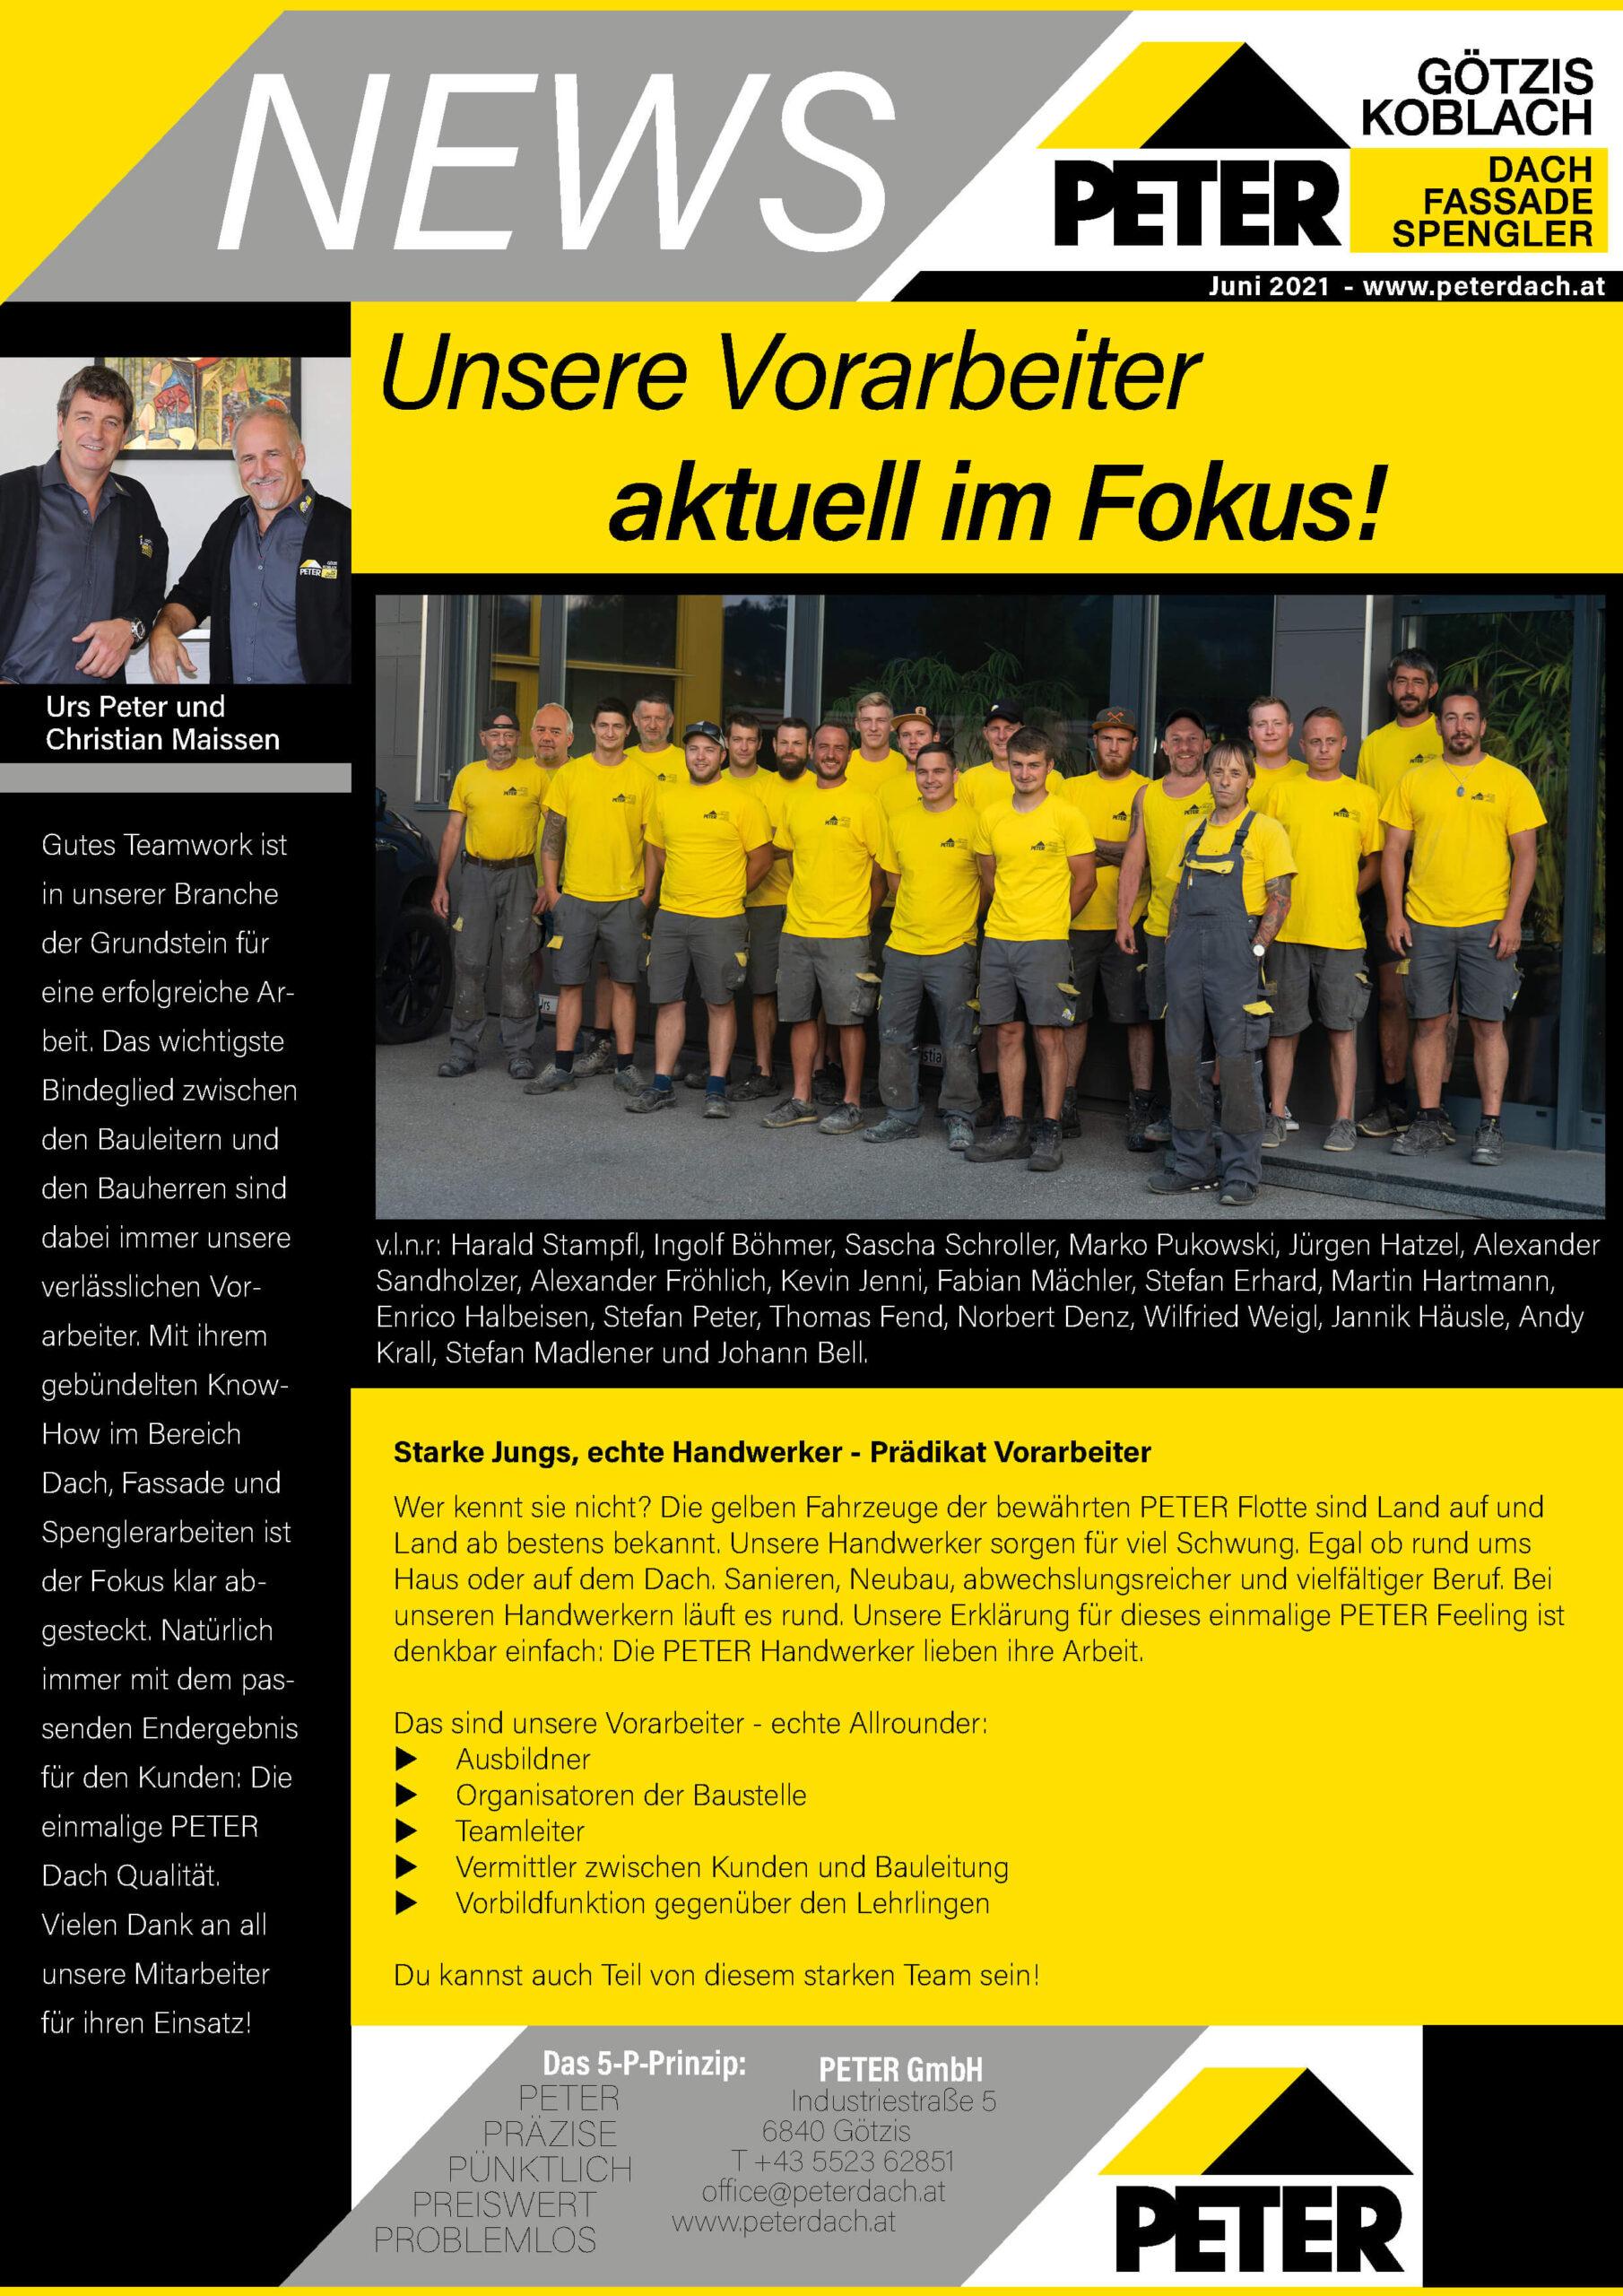 Peter-Dach-Spenglerei-Vorarlberg-News_2106_KW 24